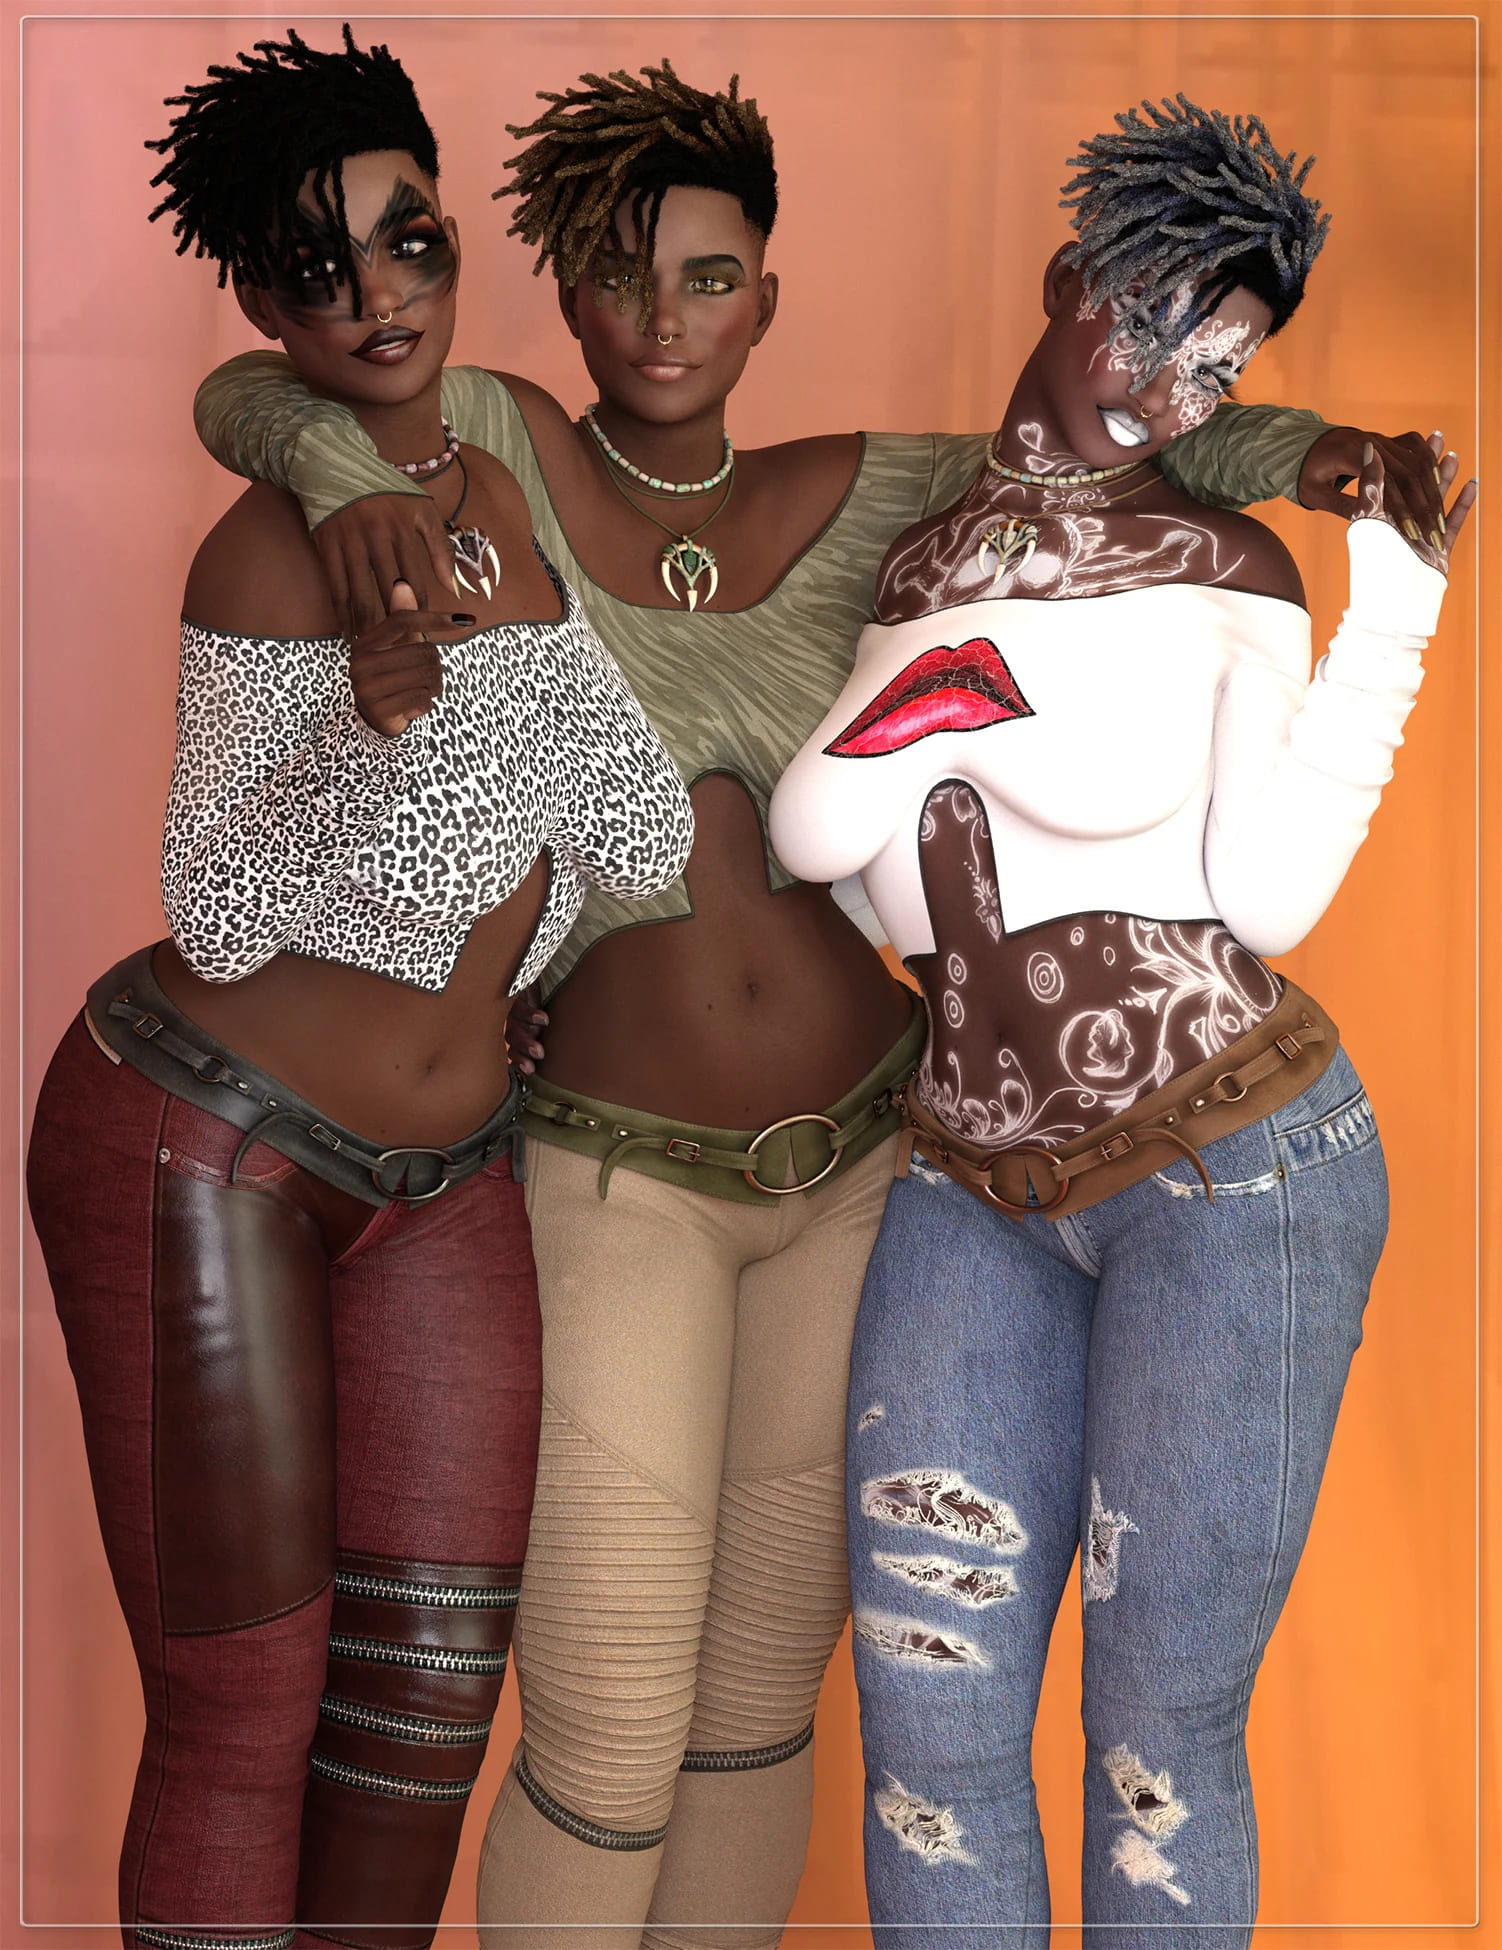 LIL-Shantrea for Genesis 8 Female_DAZ3D下载站